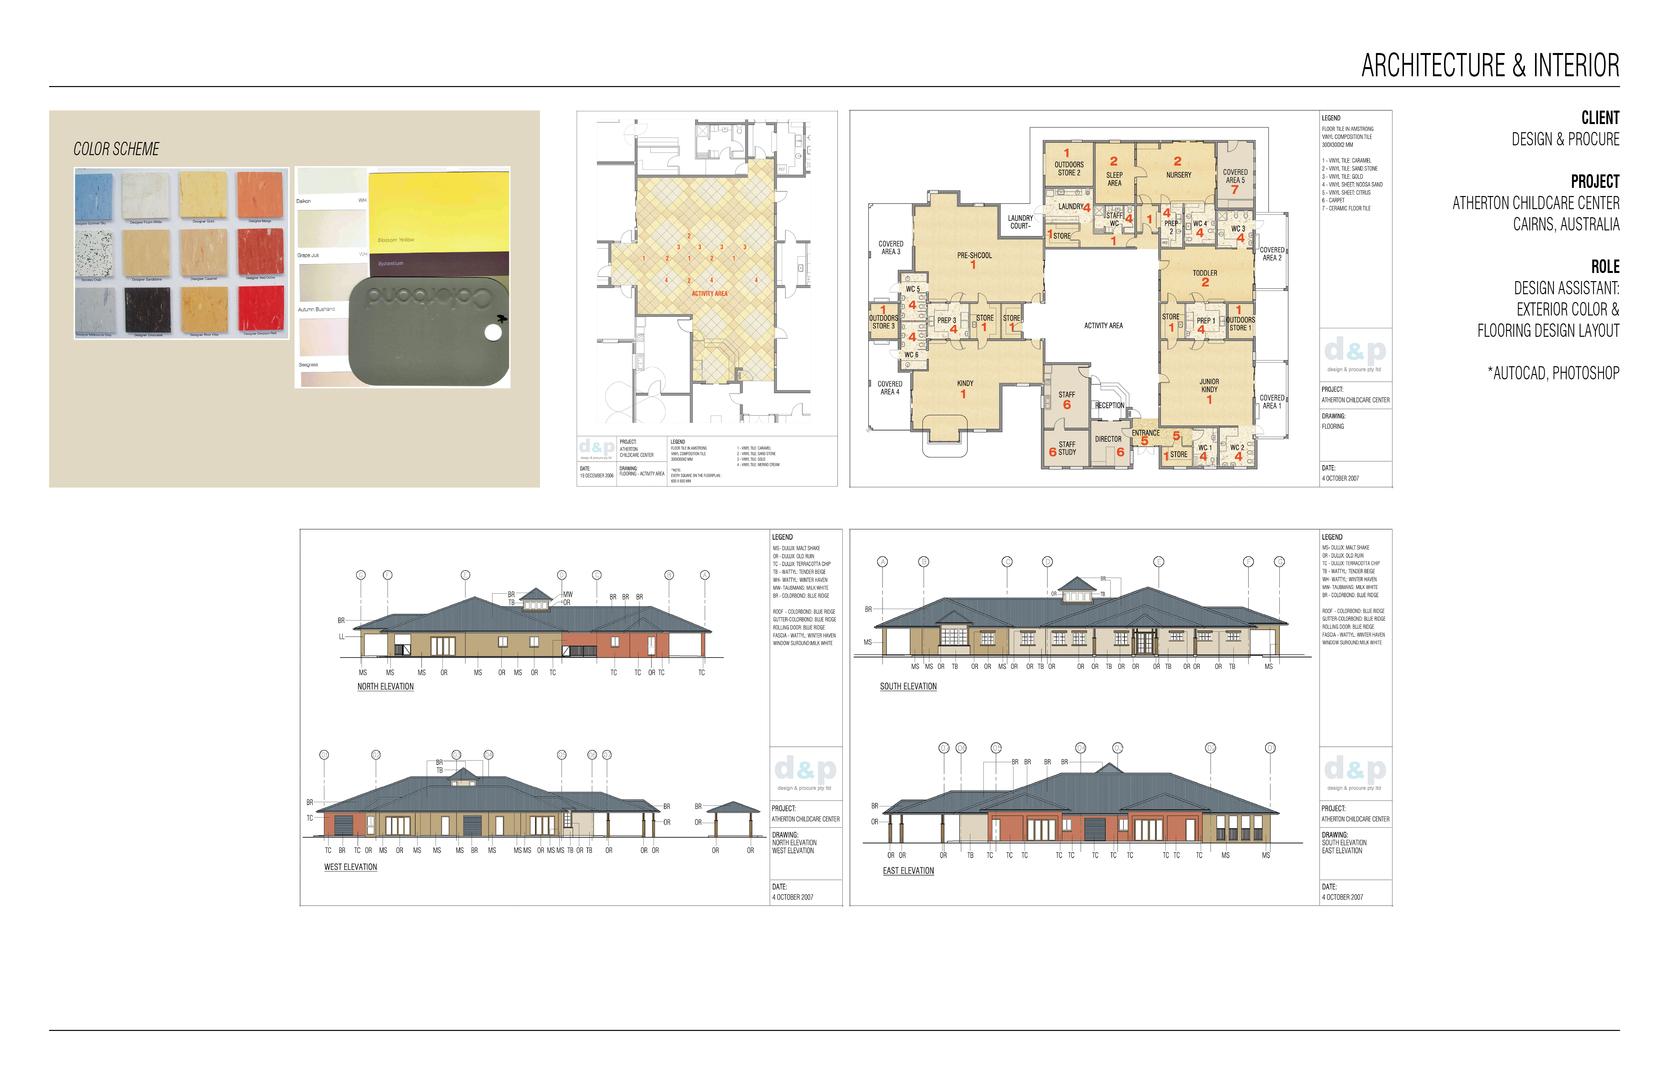 Architecture interior ccuart Choice Image